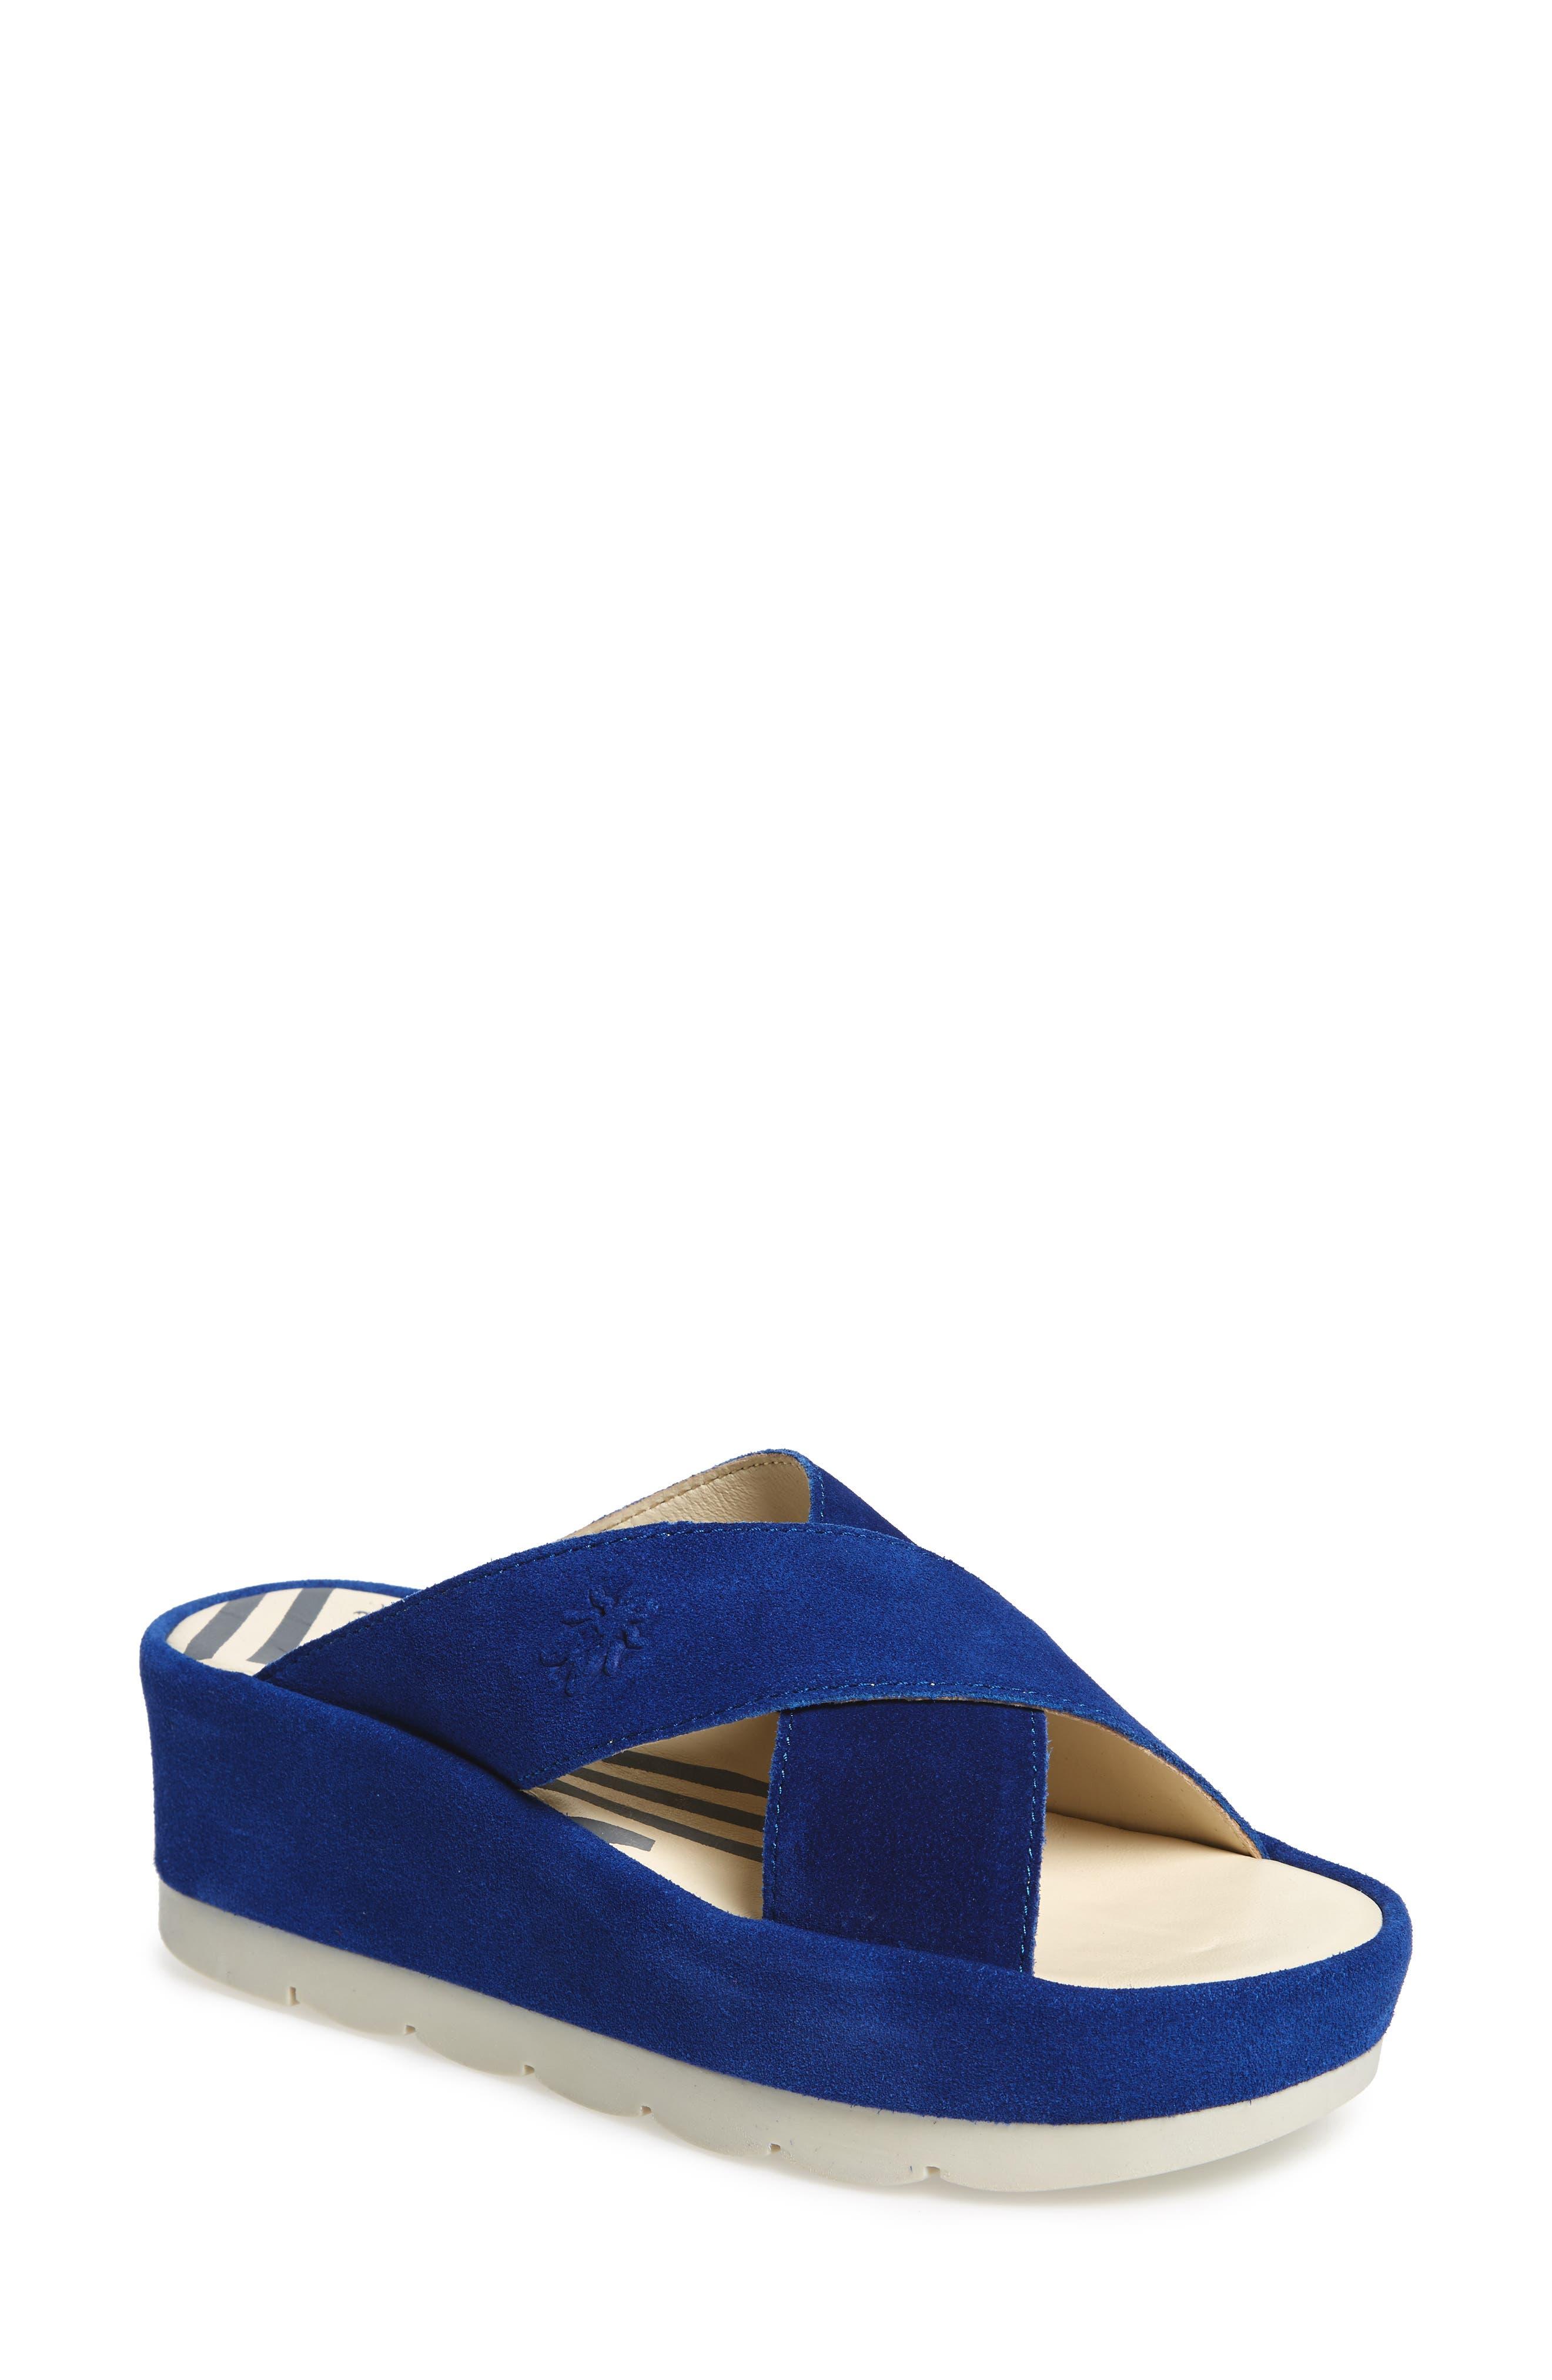 Begs Platform Slide Sandal,                             Main thumbnail 1, color,                             BLUE SUEDE